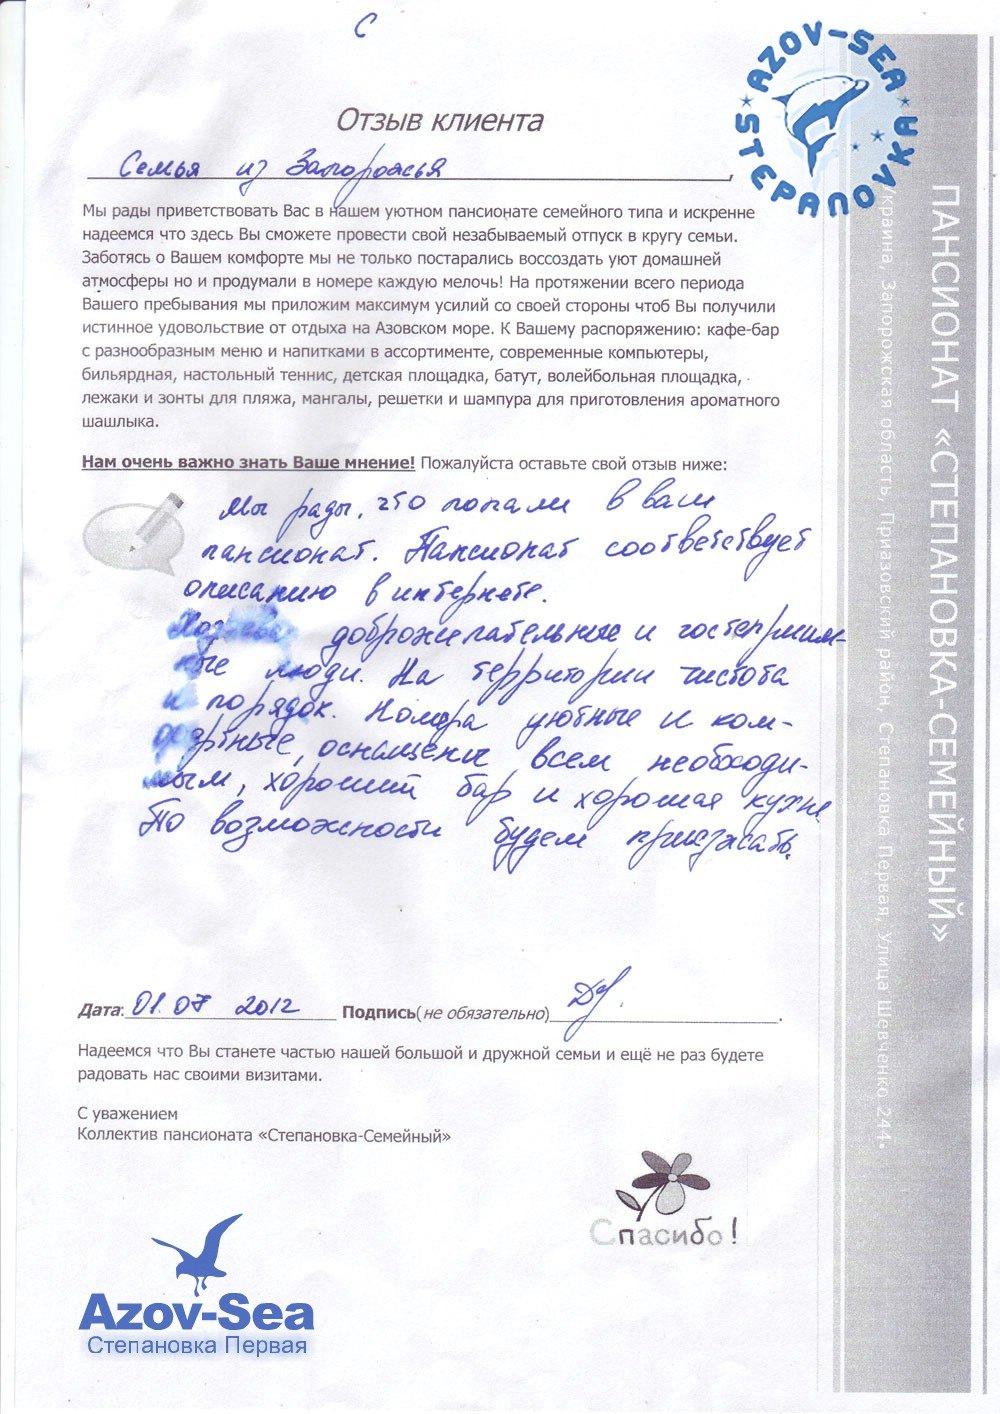 Пансионат Степановка. Отзыв клиента .Отдых на азовском море.